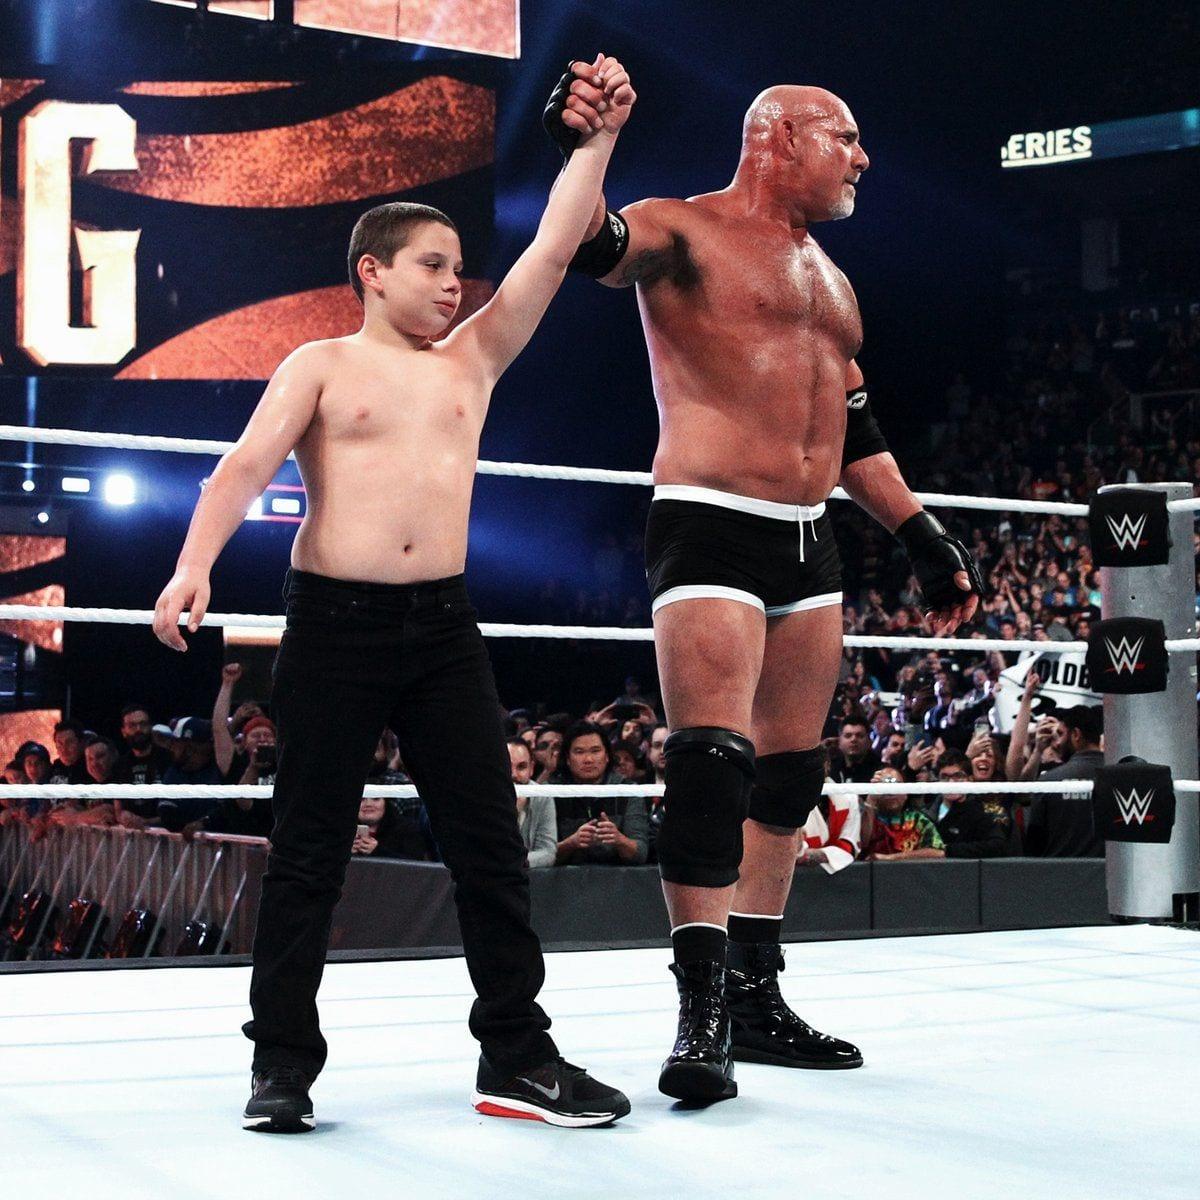 Goldberg with his son WWE Survivor Series 2016